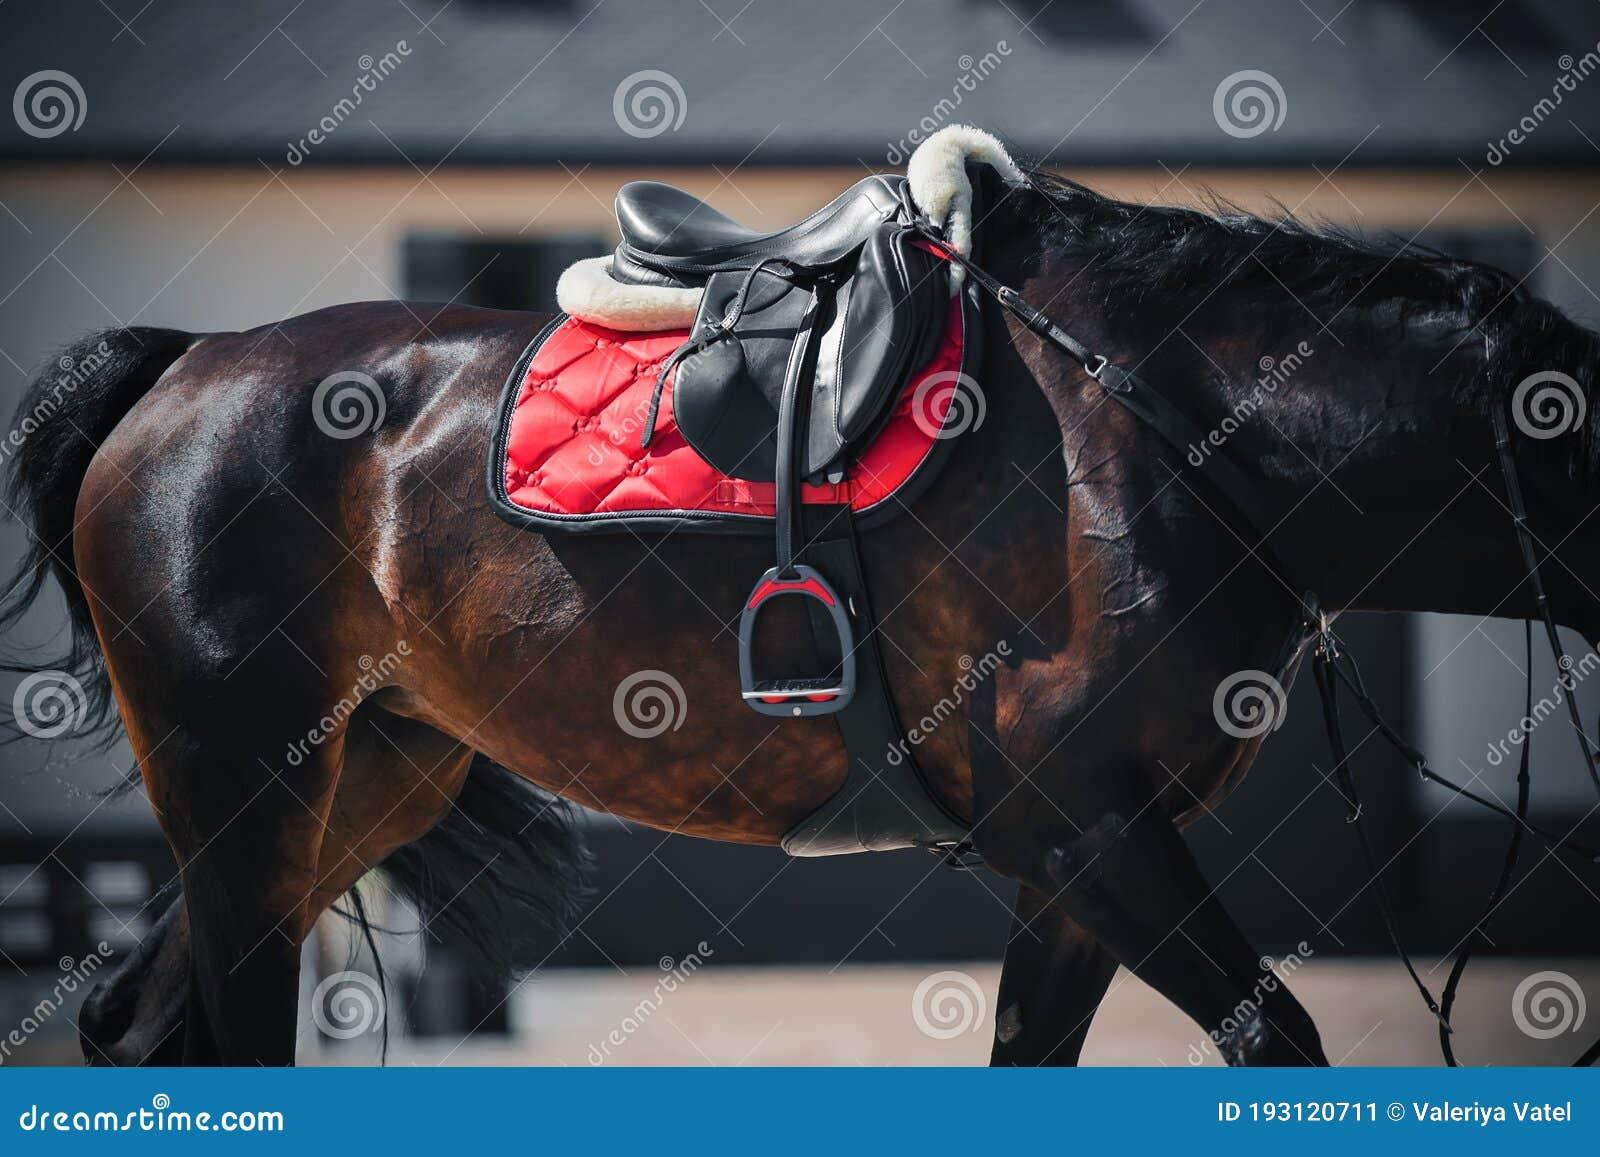 3 999 Saddle Stirrup Photos Free Royalty Free Stock Photos From Dreamstime